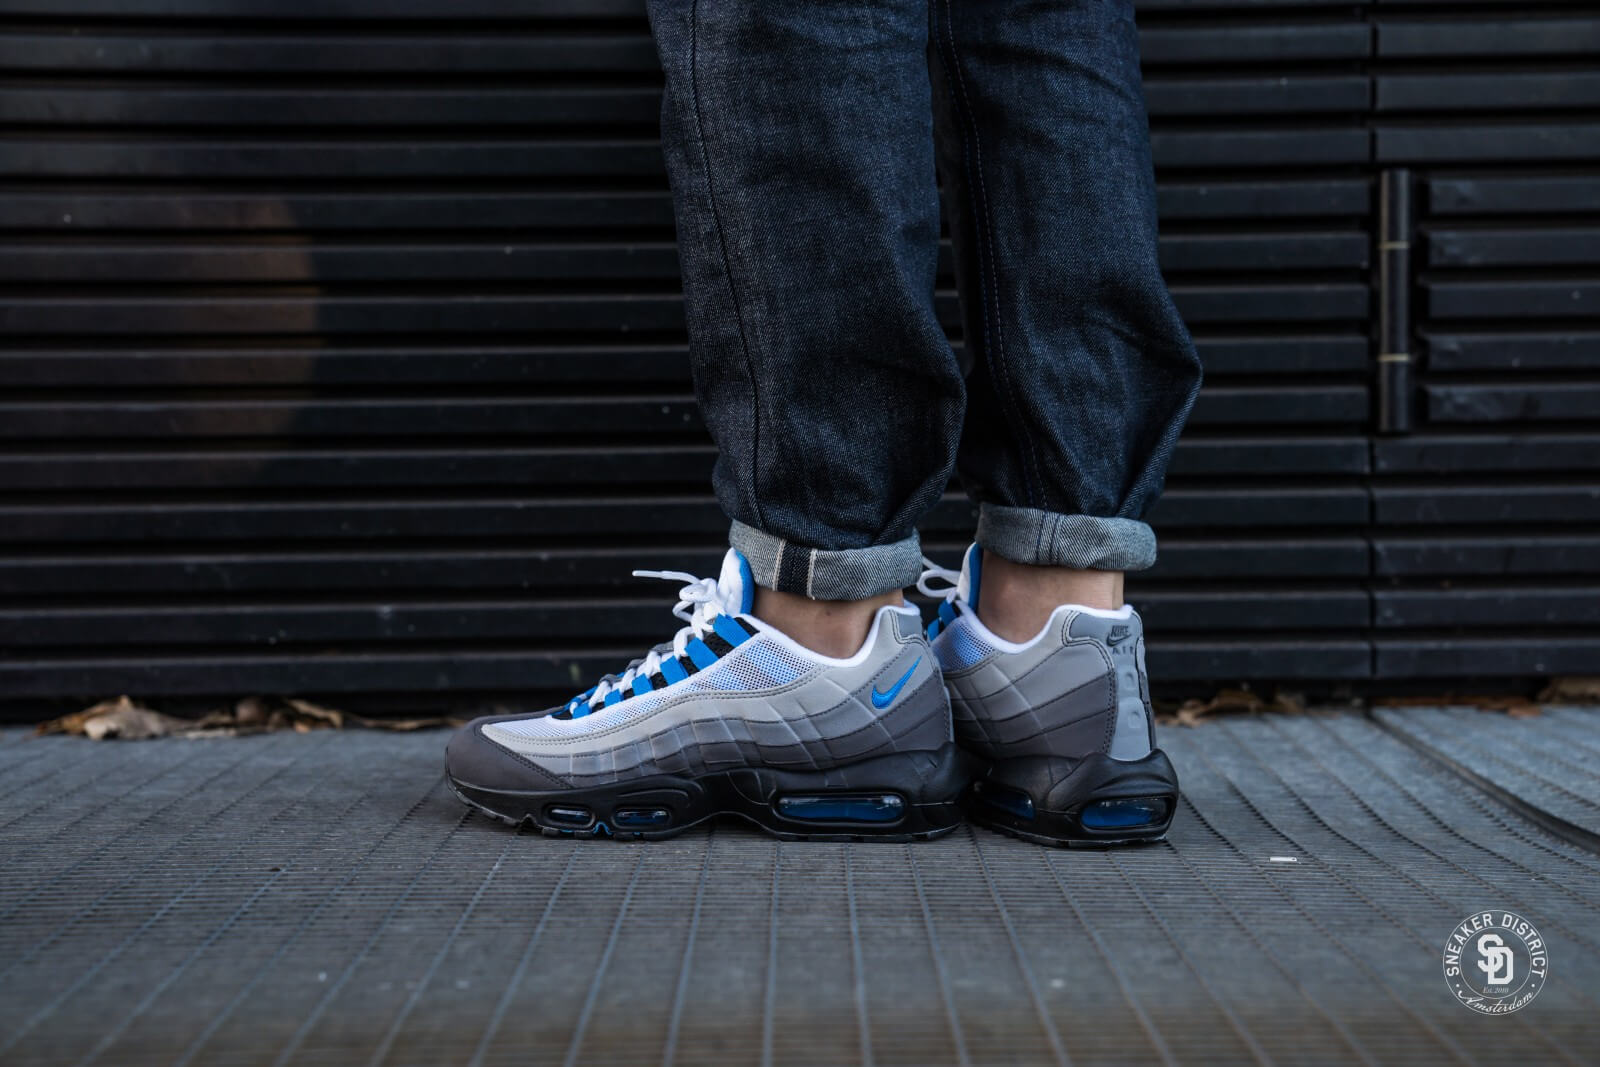 air max 95 white and blue